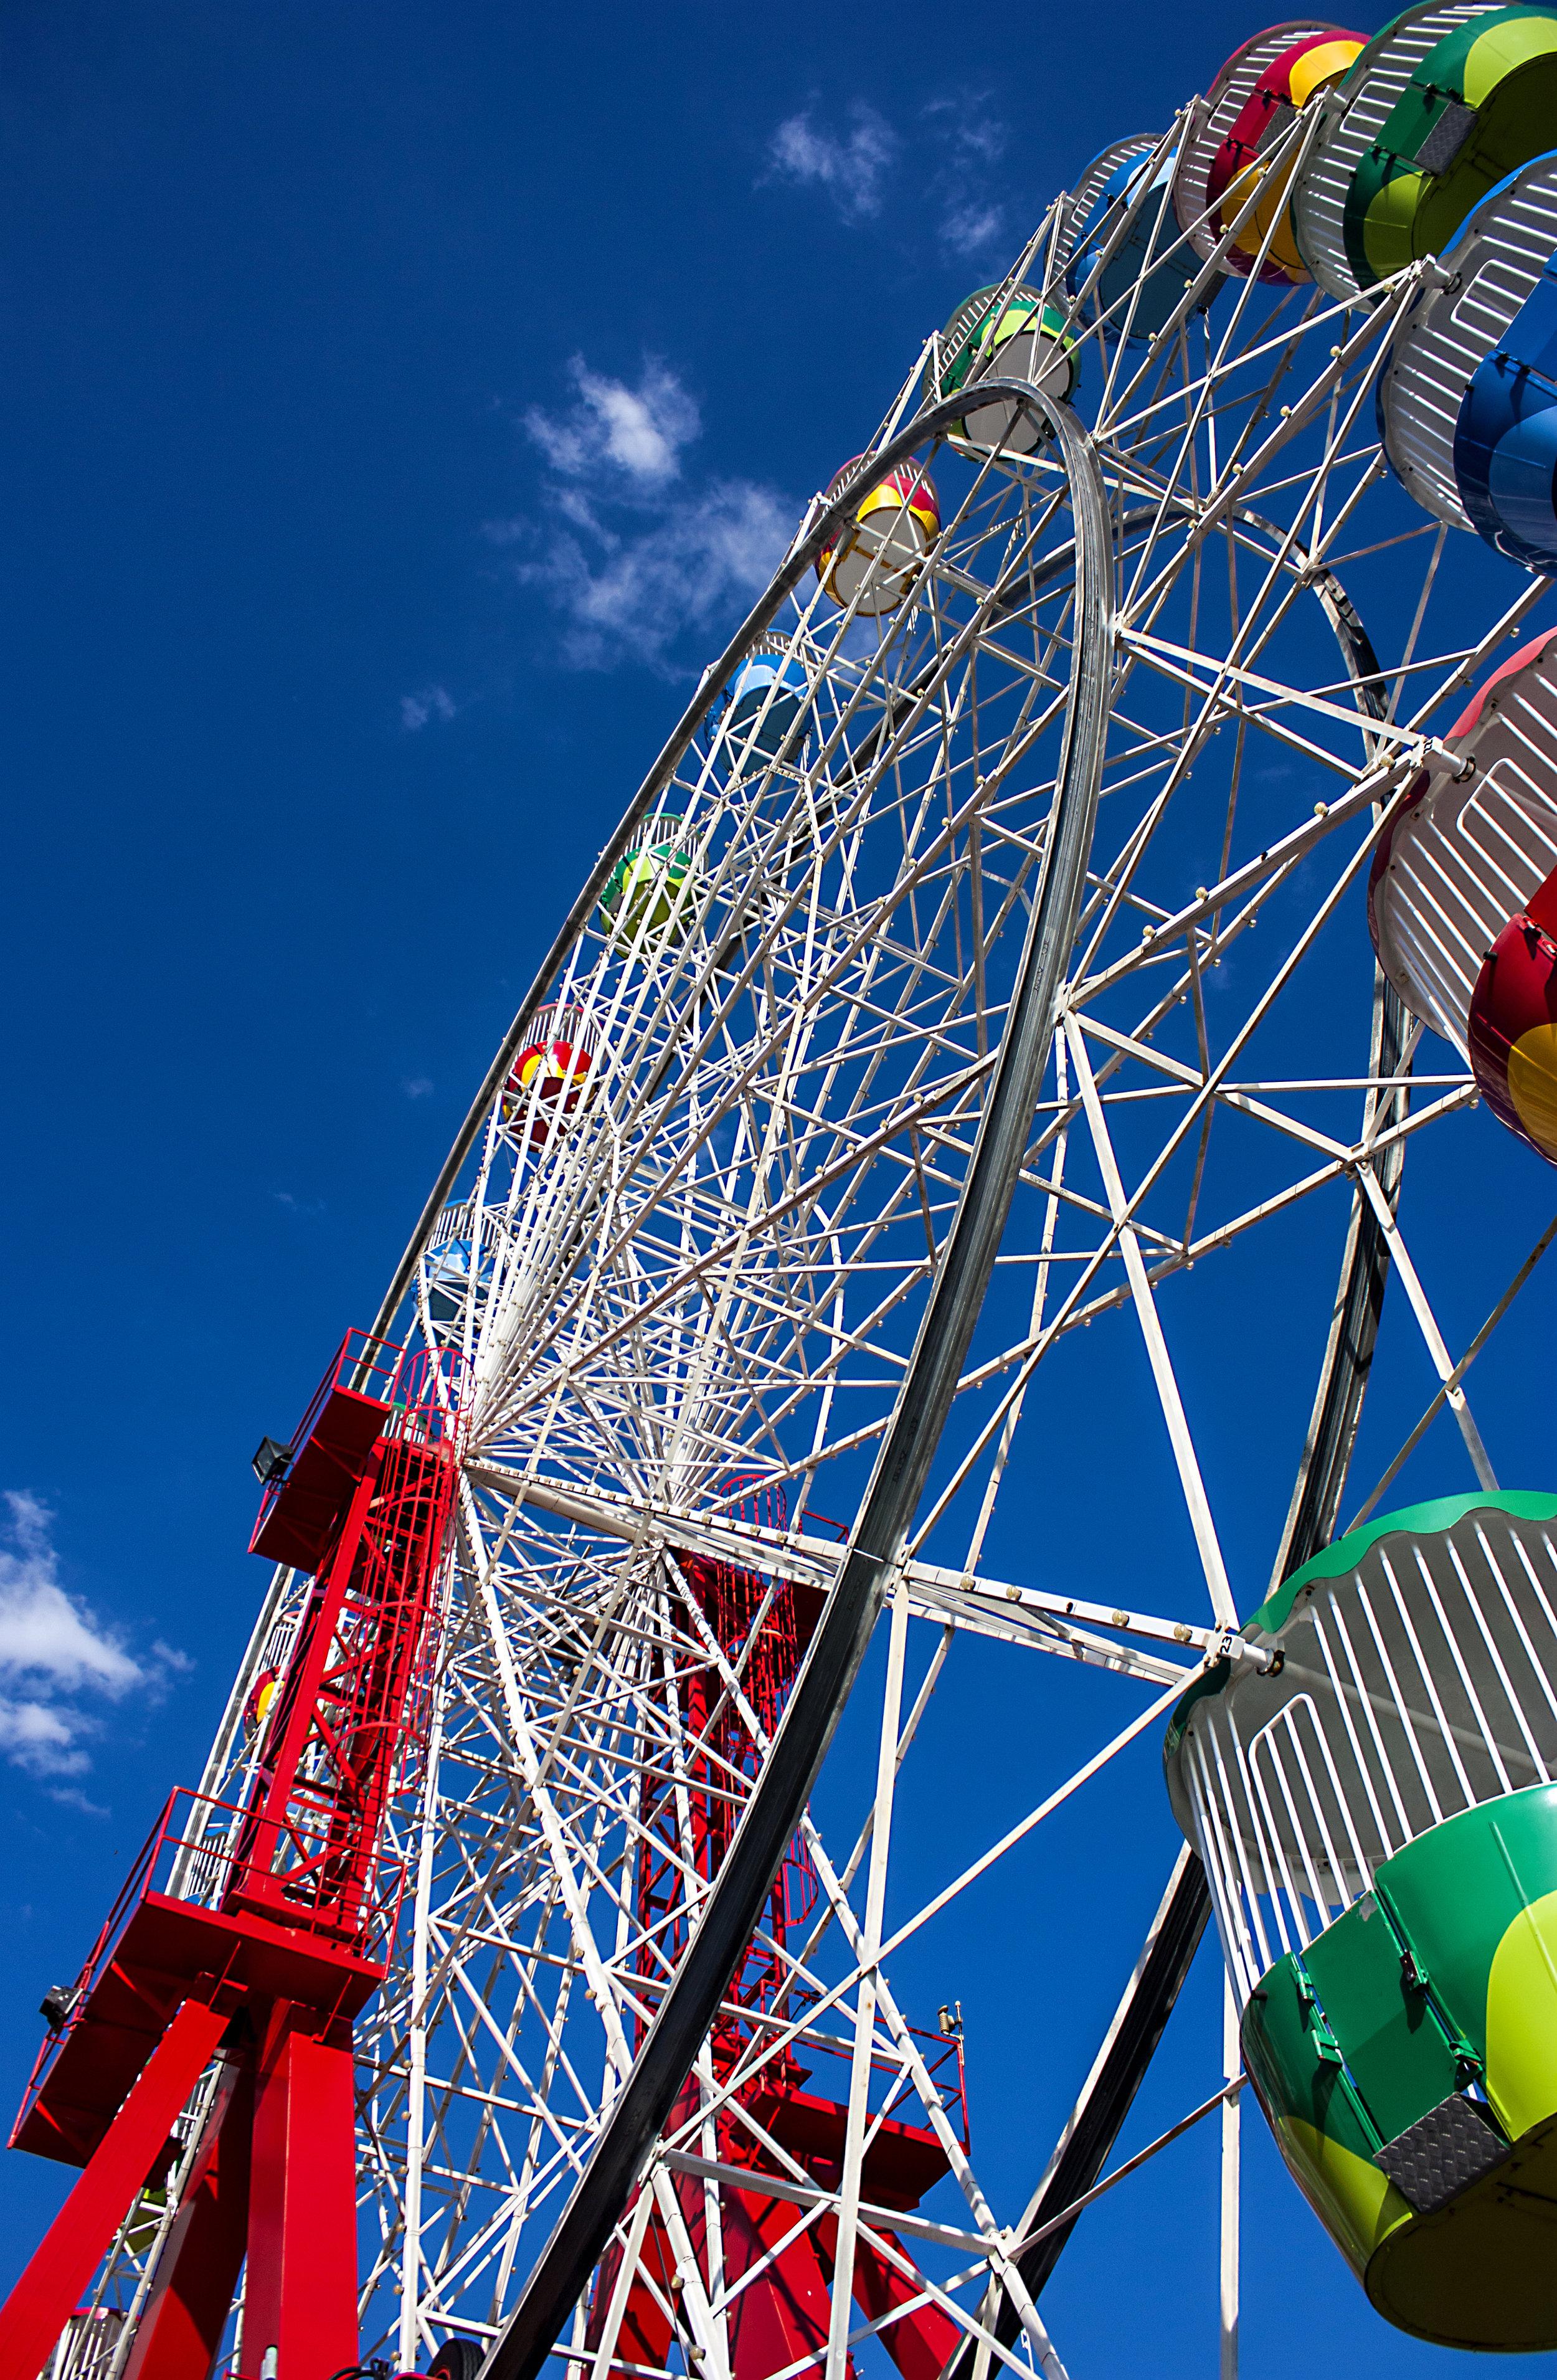 Australia_Sydney_Luna Park Ferris Wheel.jpg